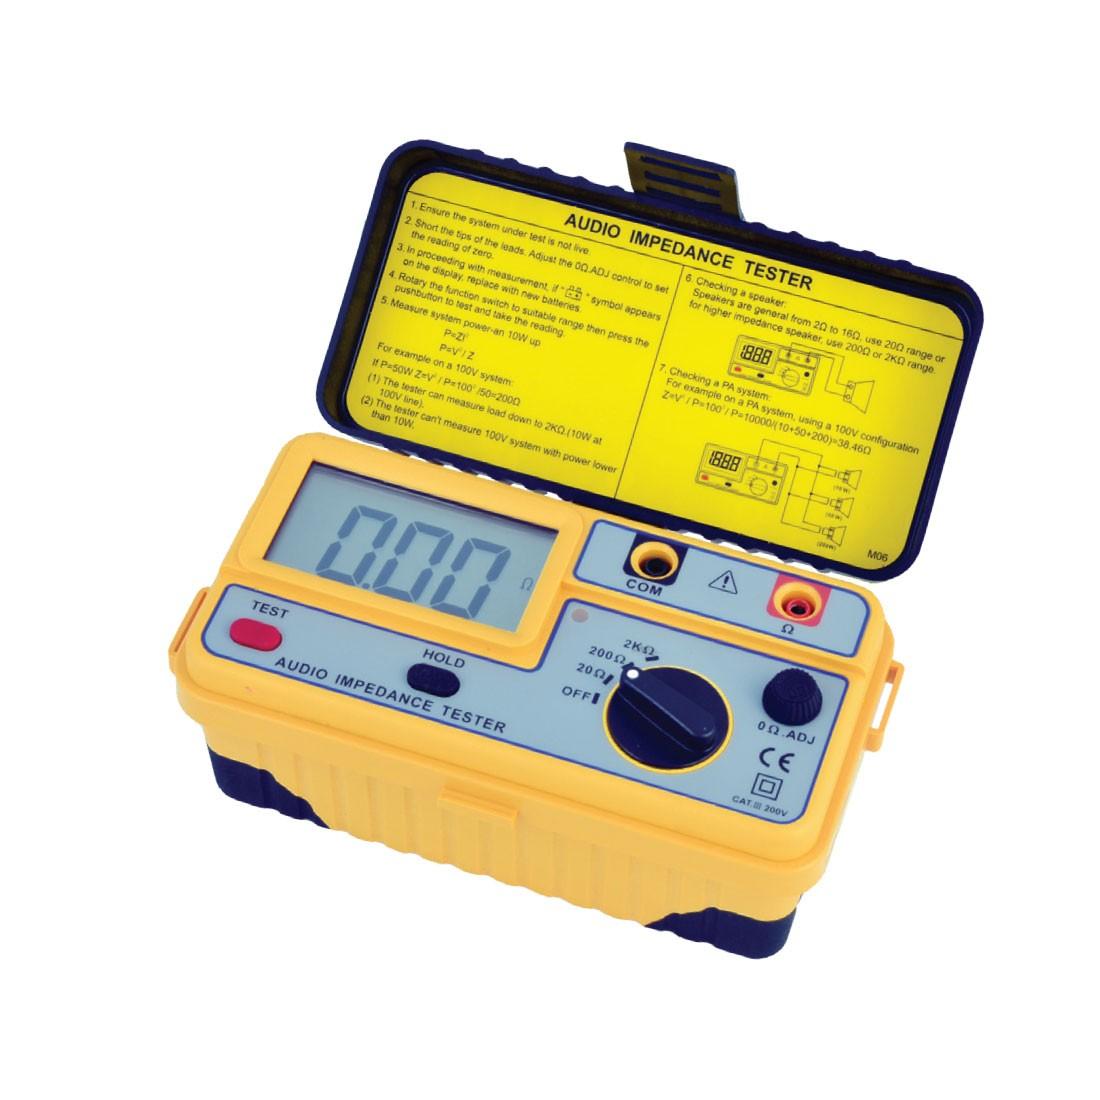 1107IM Audio Impedance Tester